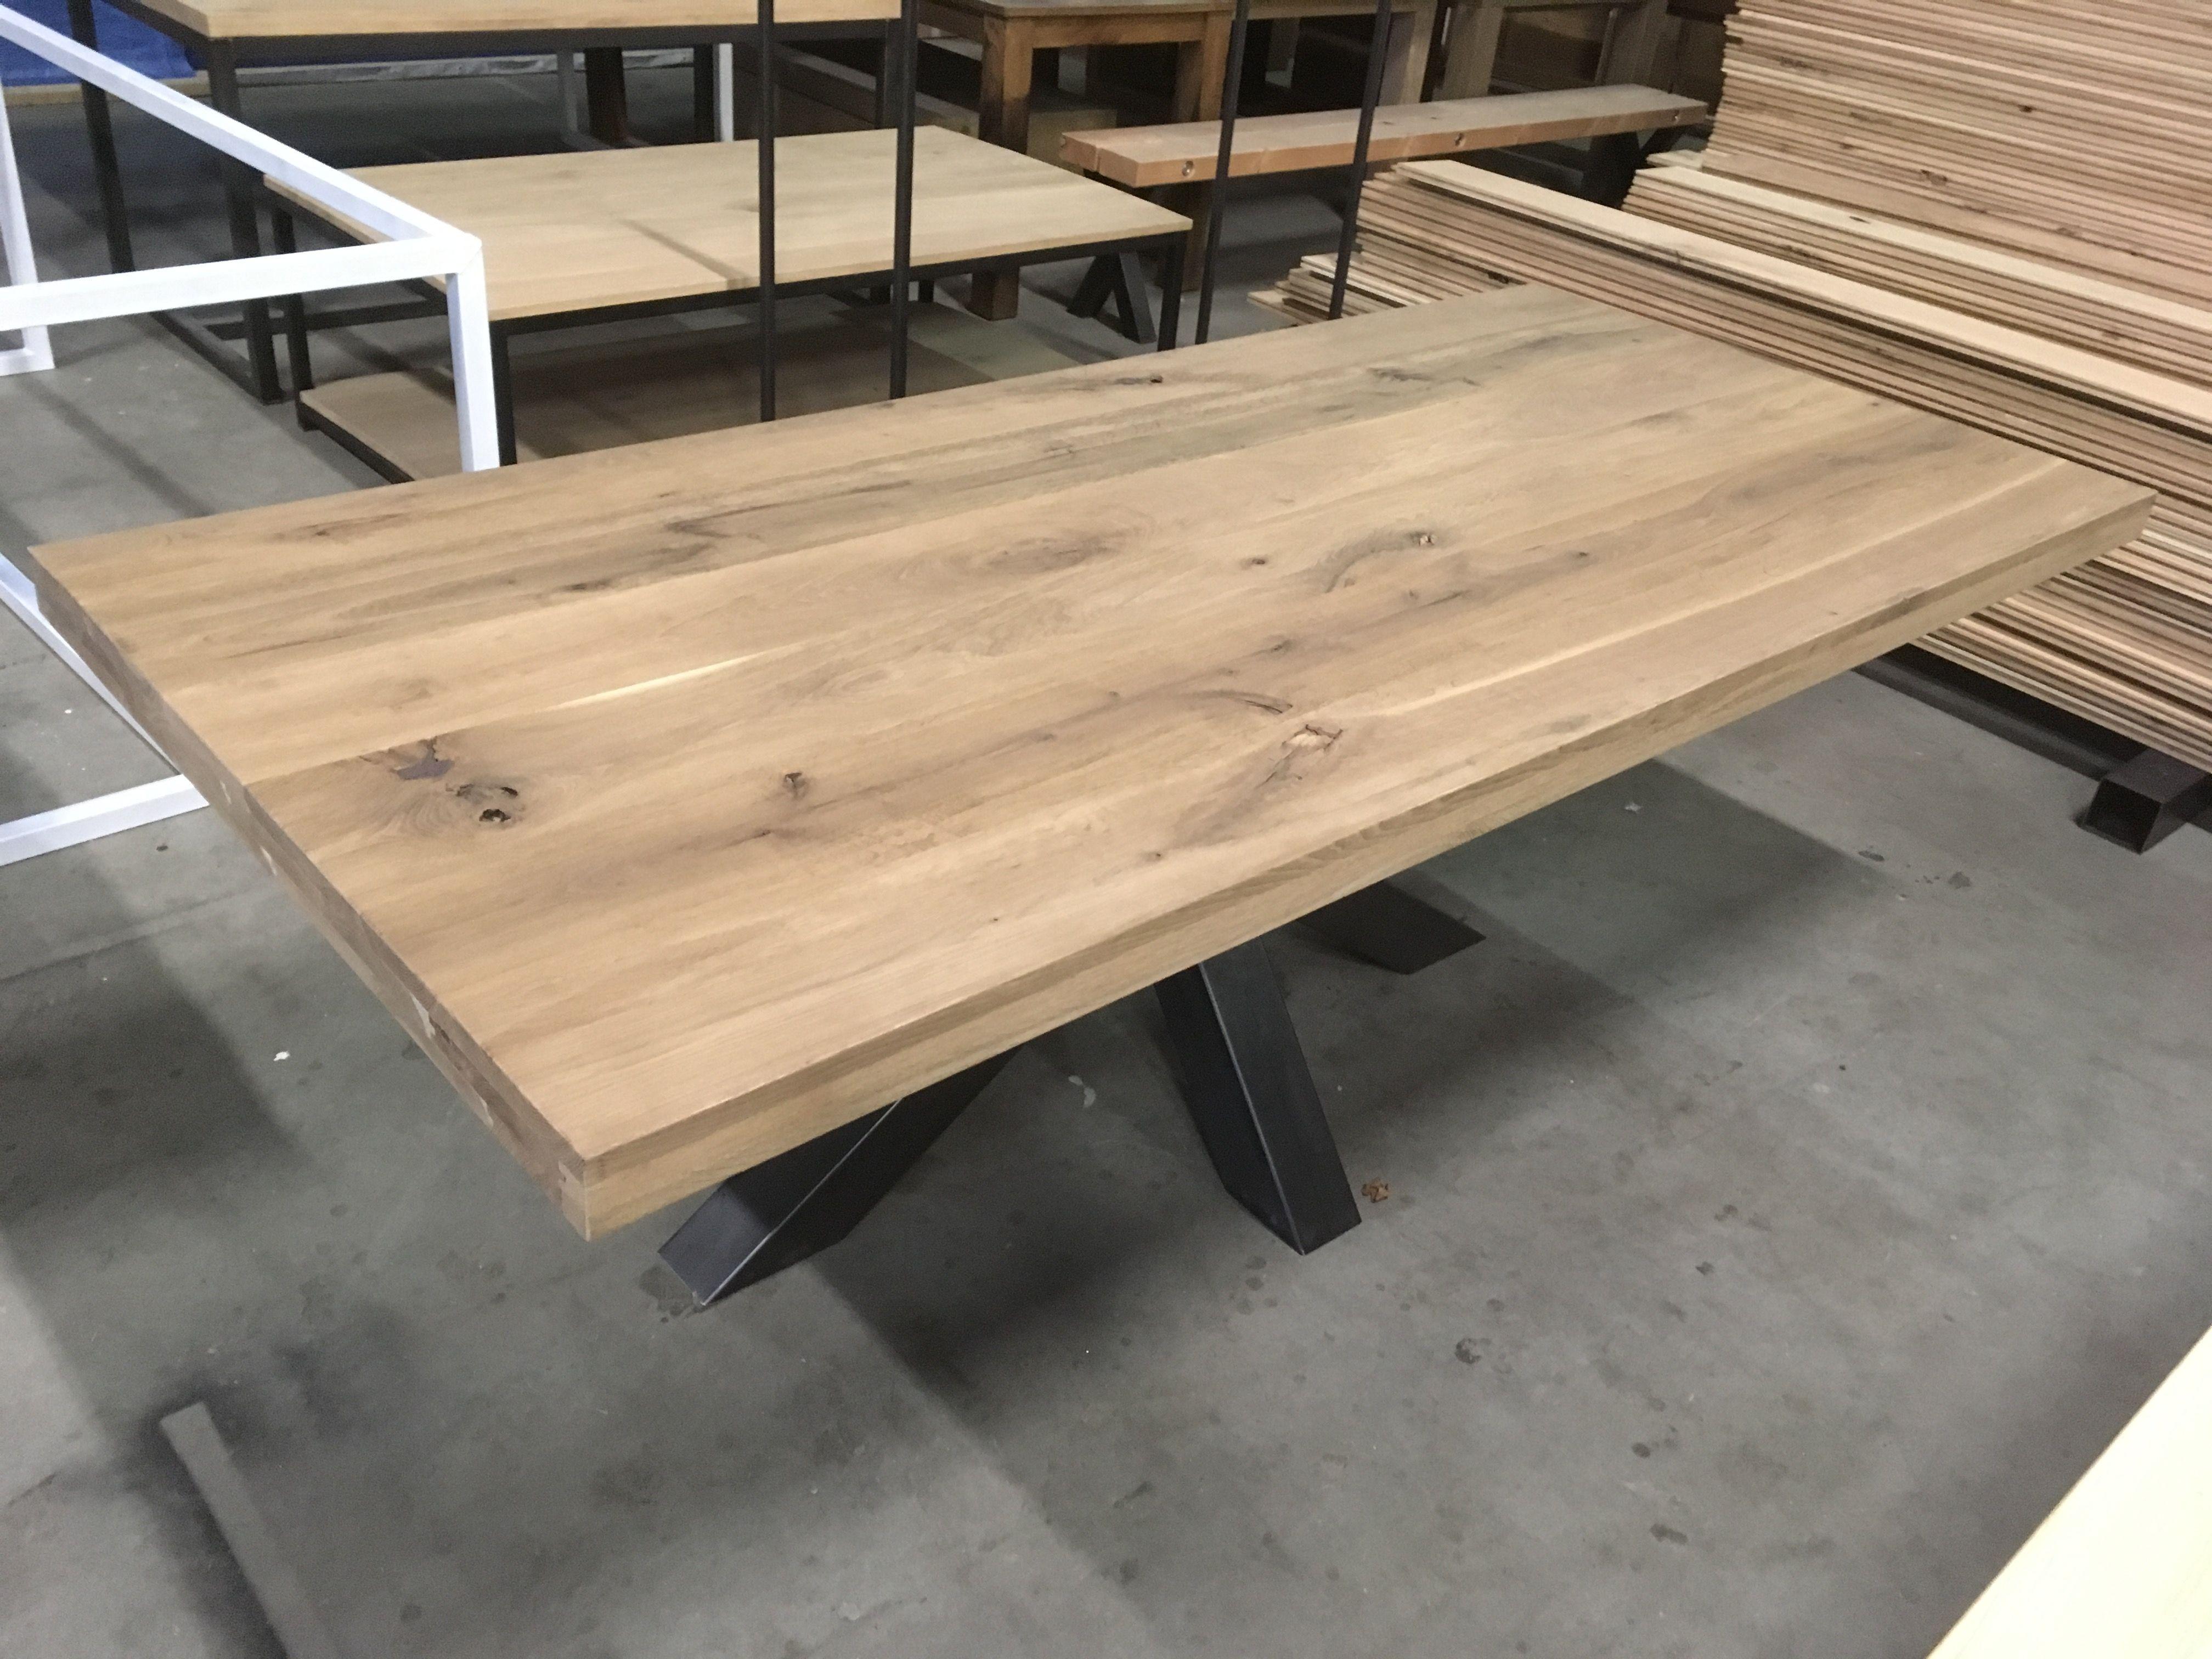 Gerookt Eiken Tafel : Tafelblad gerookt eiken skylt kaldenbach meubels table